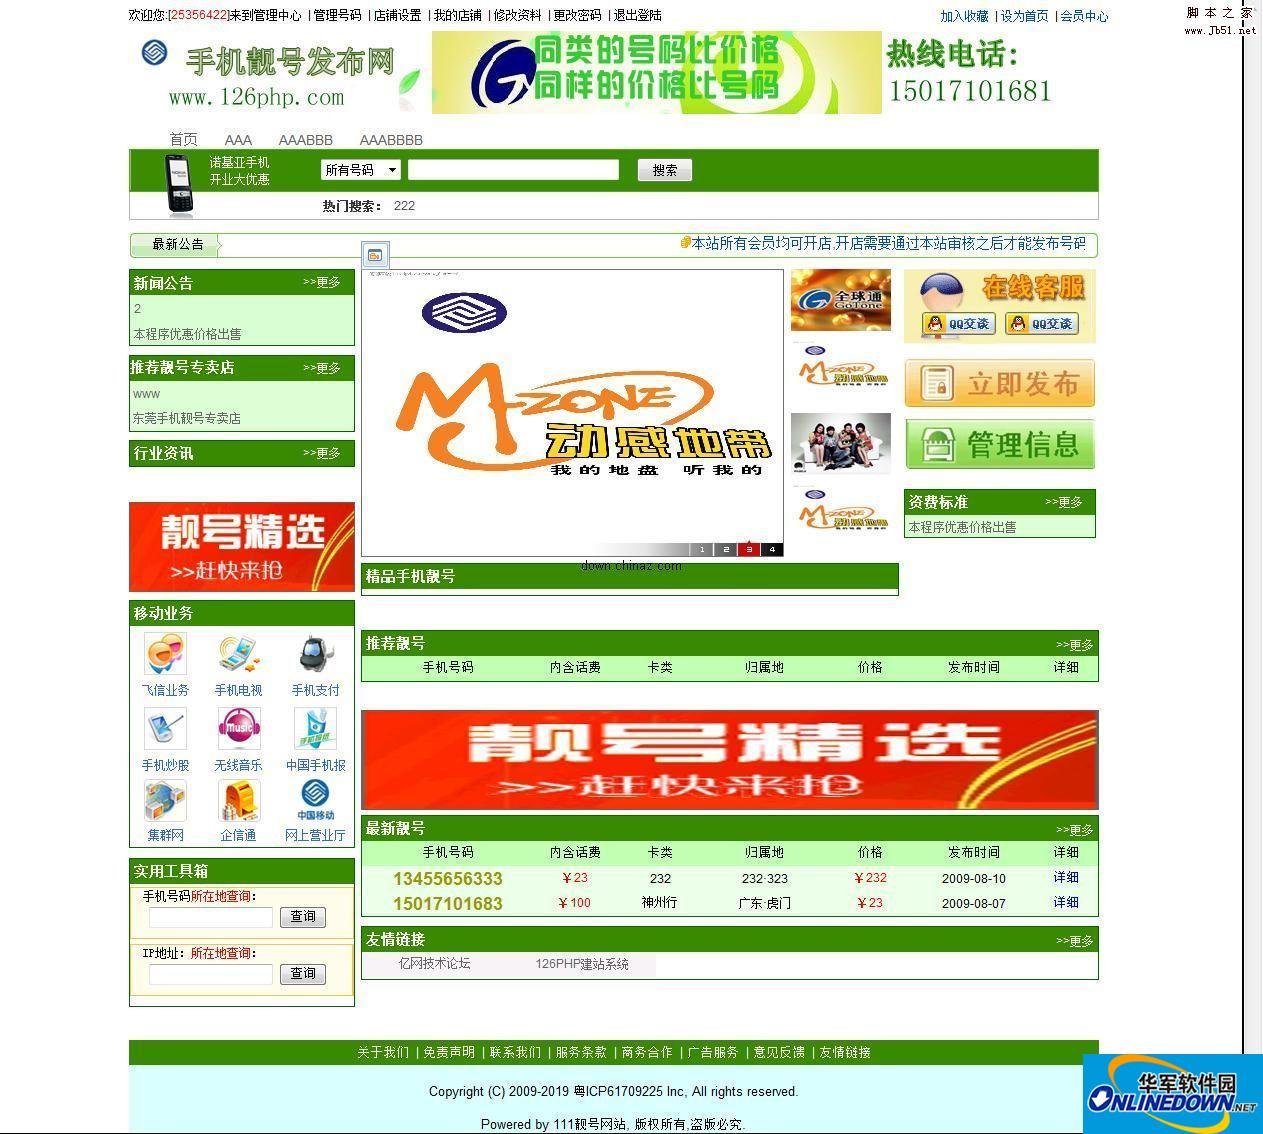 php手机靓号发布网站管理程序